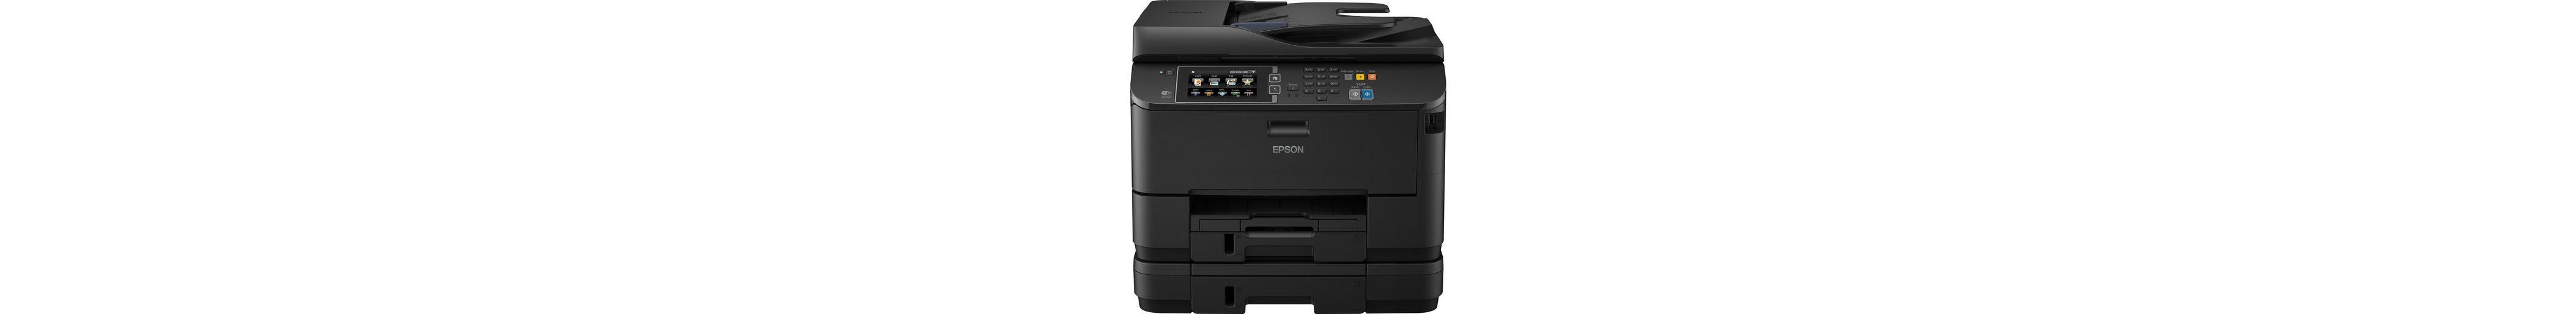 Epson WorkForce Pro WF-4640DTWF Multifunktionsdrucker